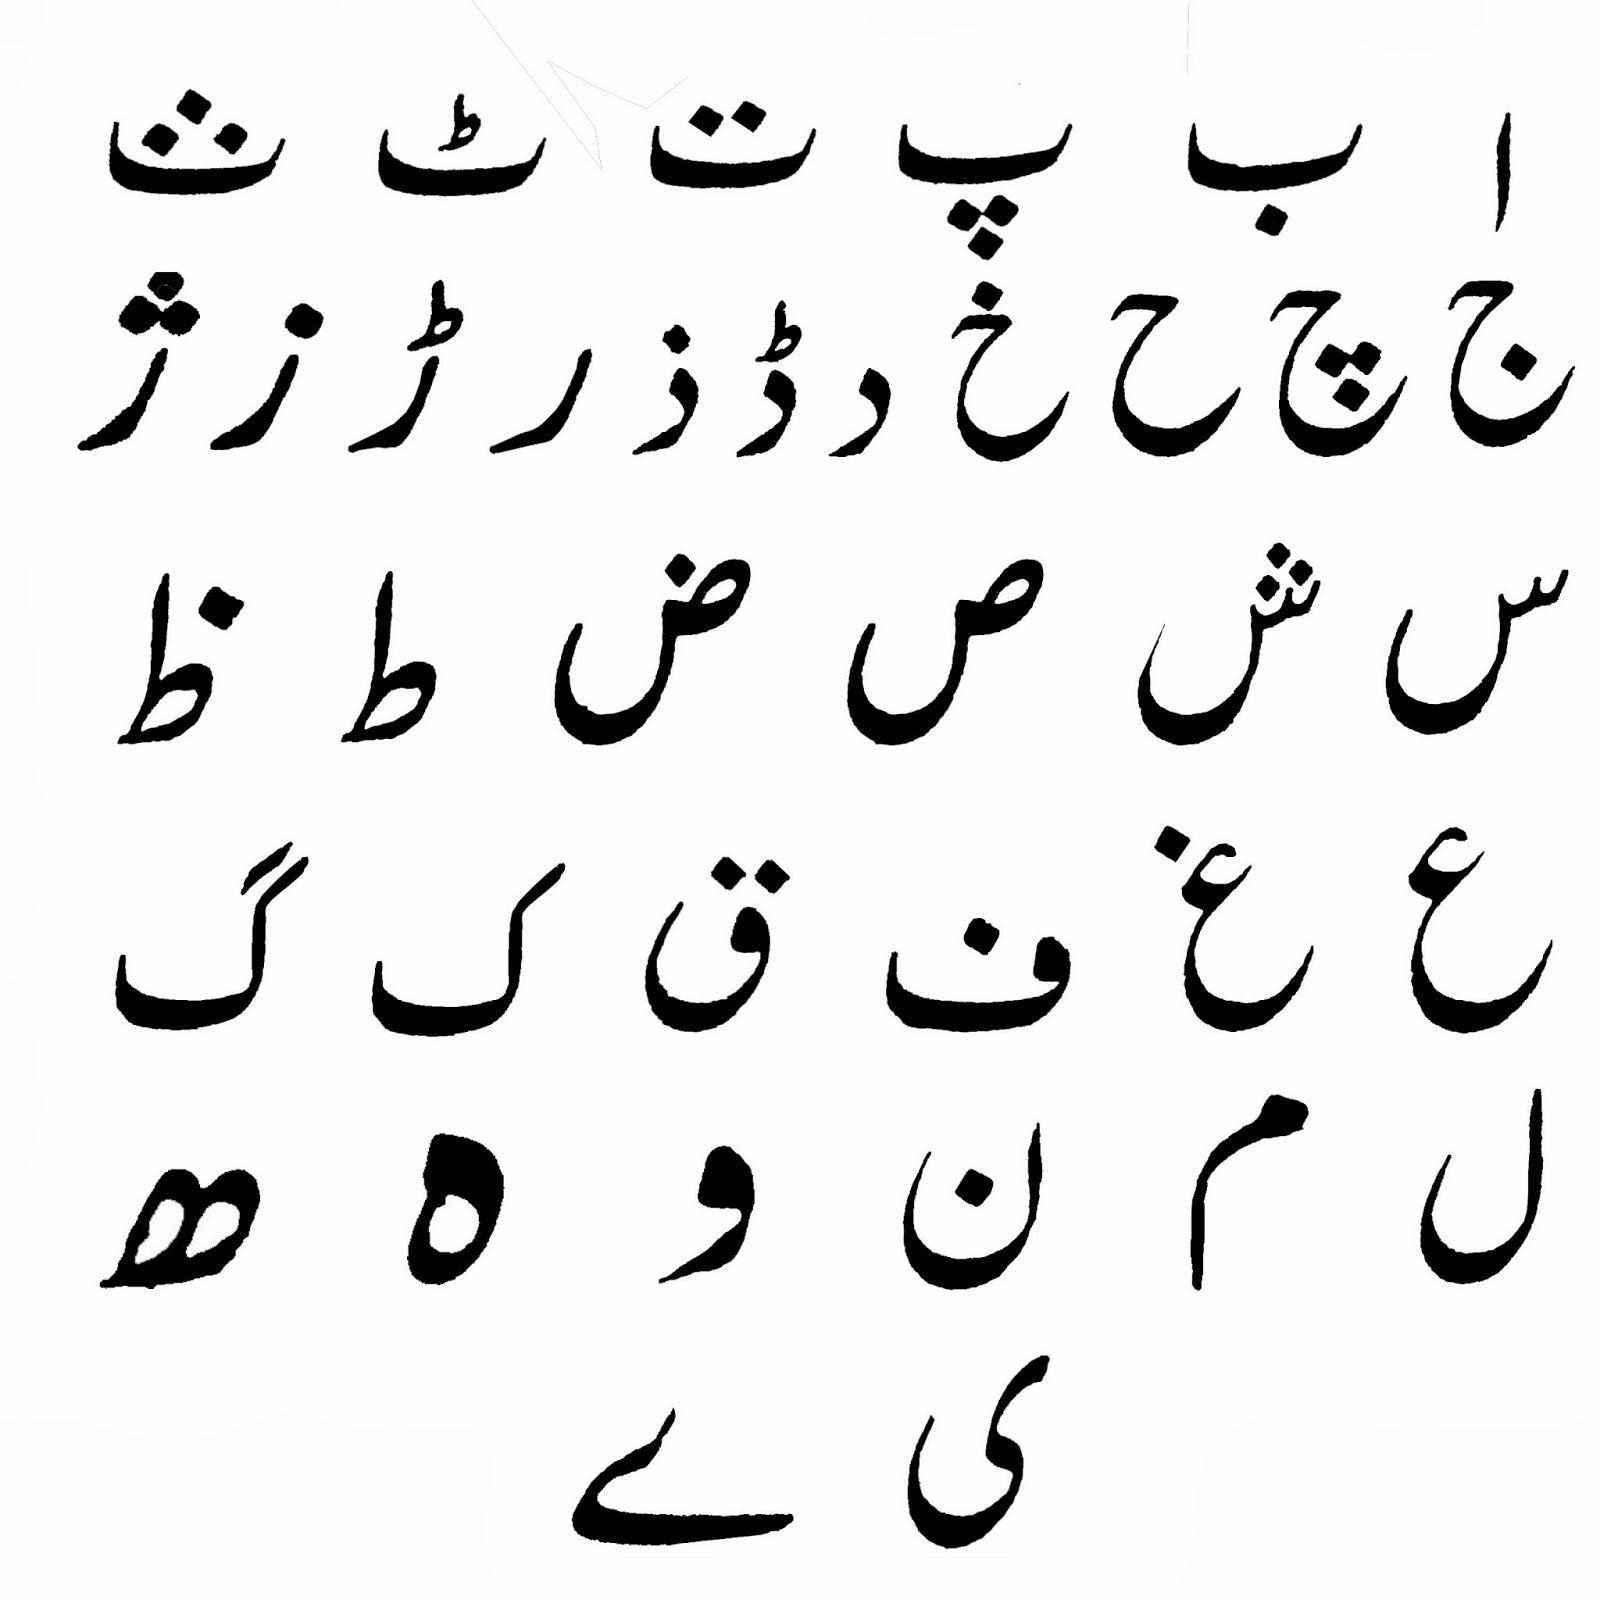 Pakistan's native languages have Perso-Arabic alphabets | THEAsiaN